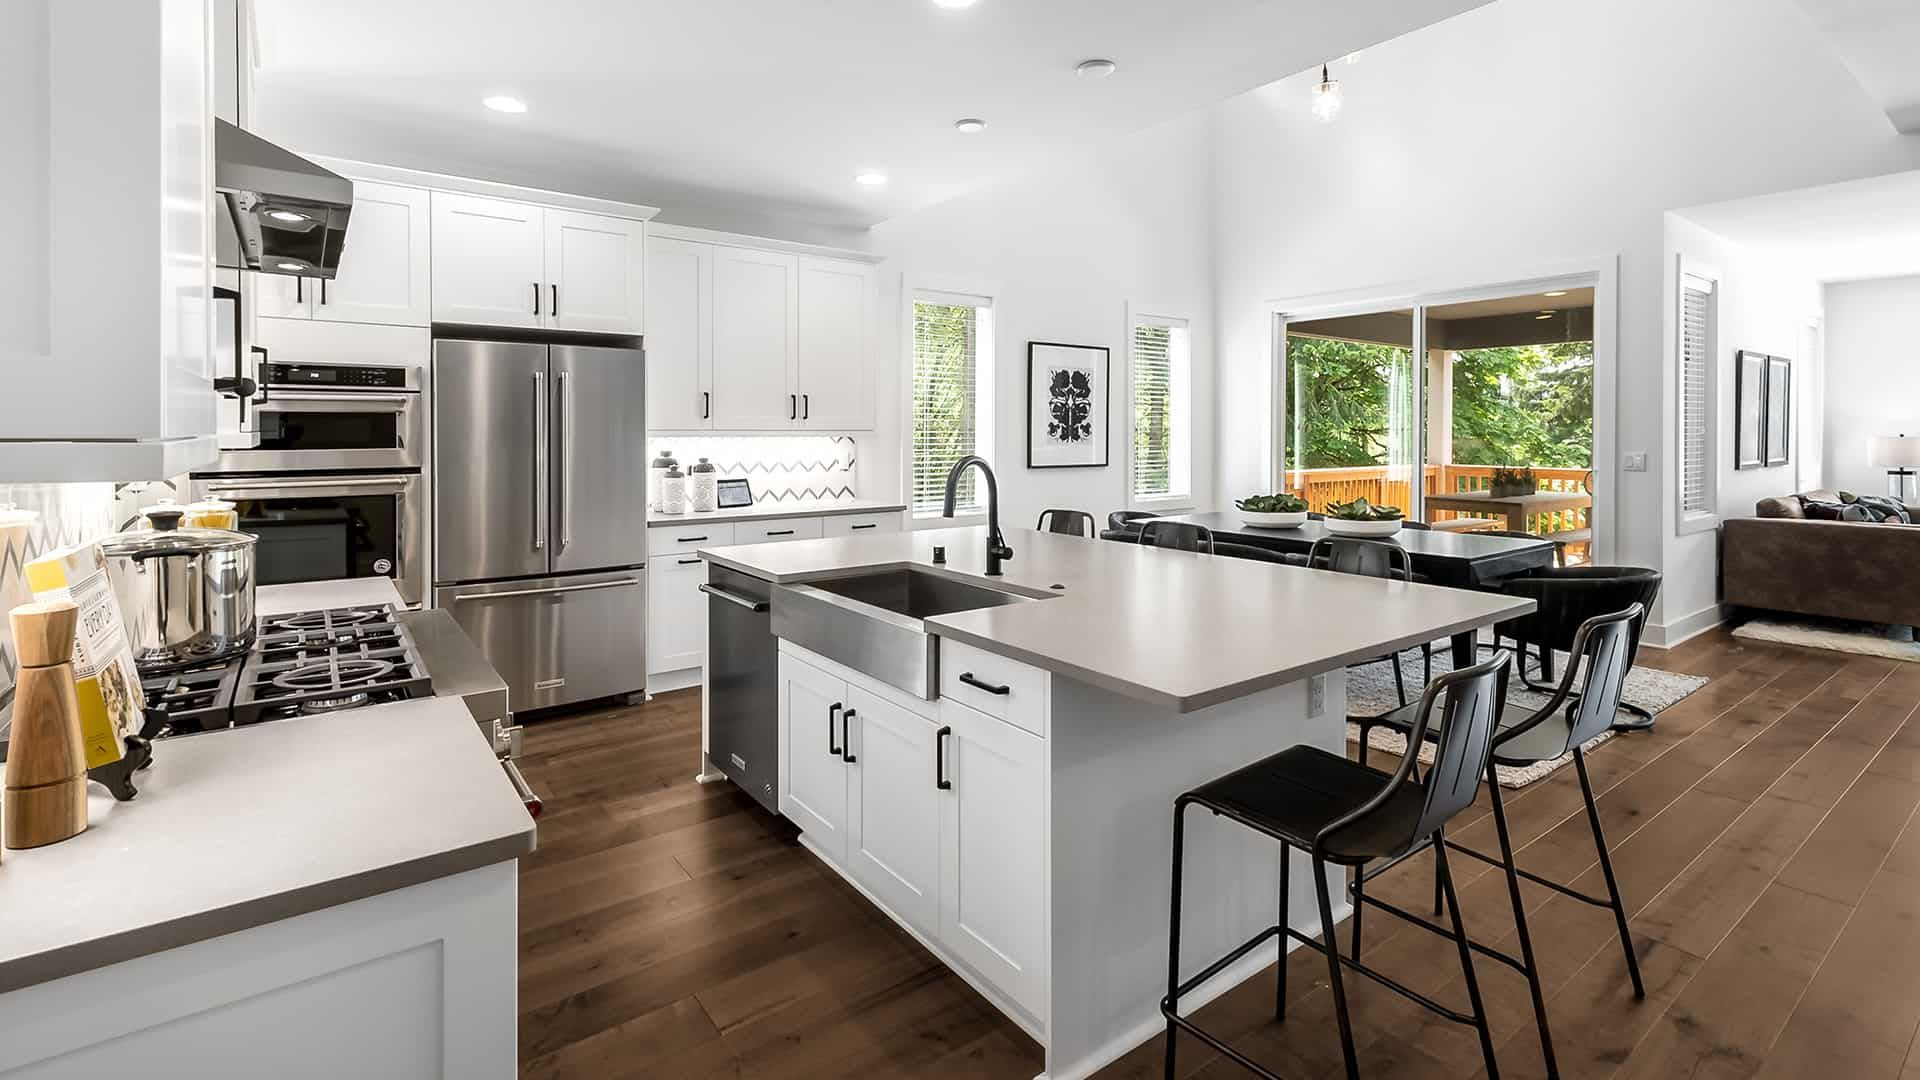 Kitchen featured in the Plan H-341DL By Tri Pointe Homes in Seattle-Bellevue, WA